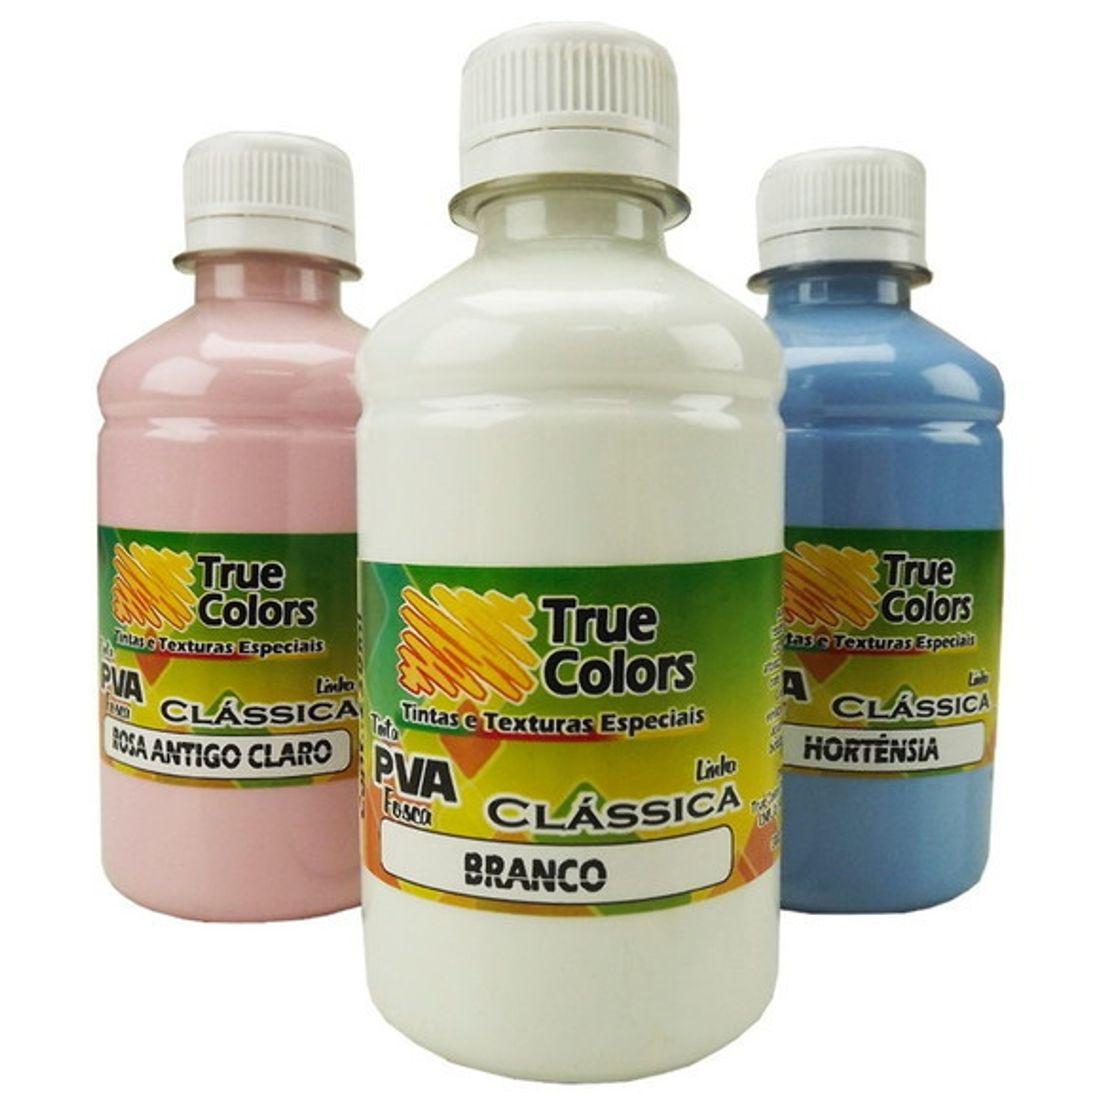 tinta-pva-fosco-tomate-250-ml-true-colors-artesanato-250mi